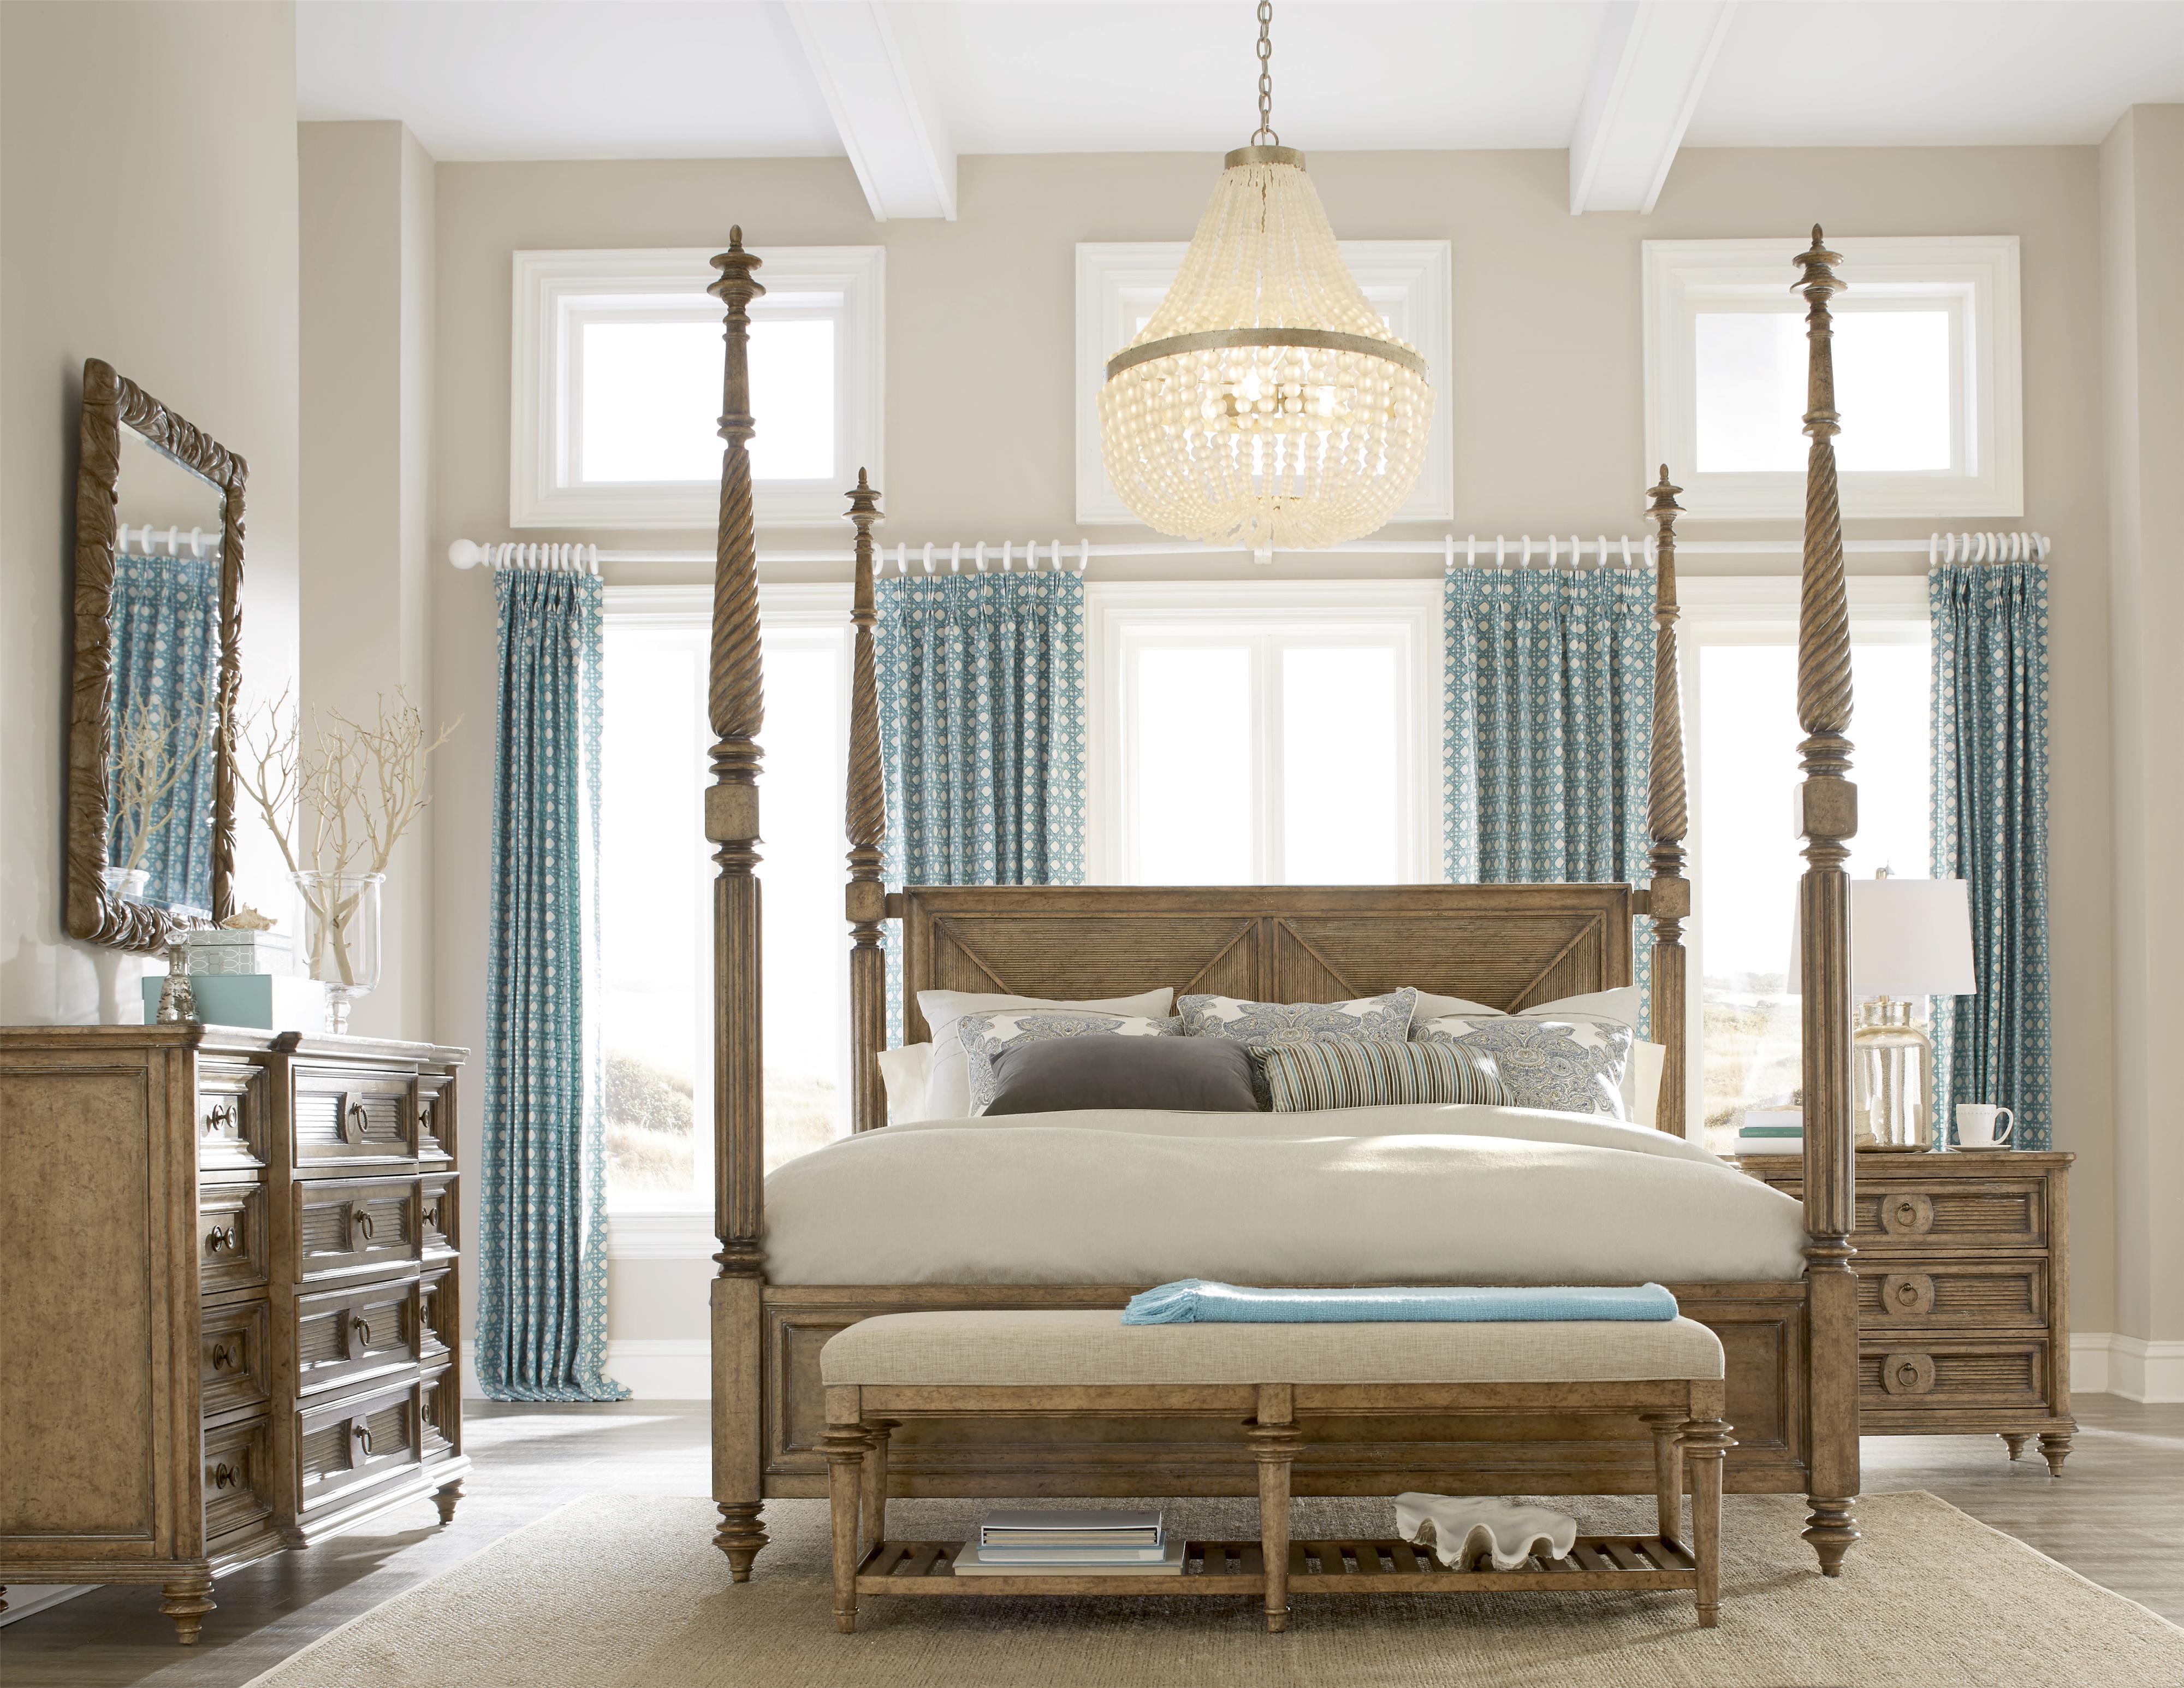 A.R.T. Furniture Inc Pavilion Queen Bedroom Group - Item Number: 229000-2608 Q Bedroom Group 5